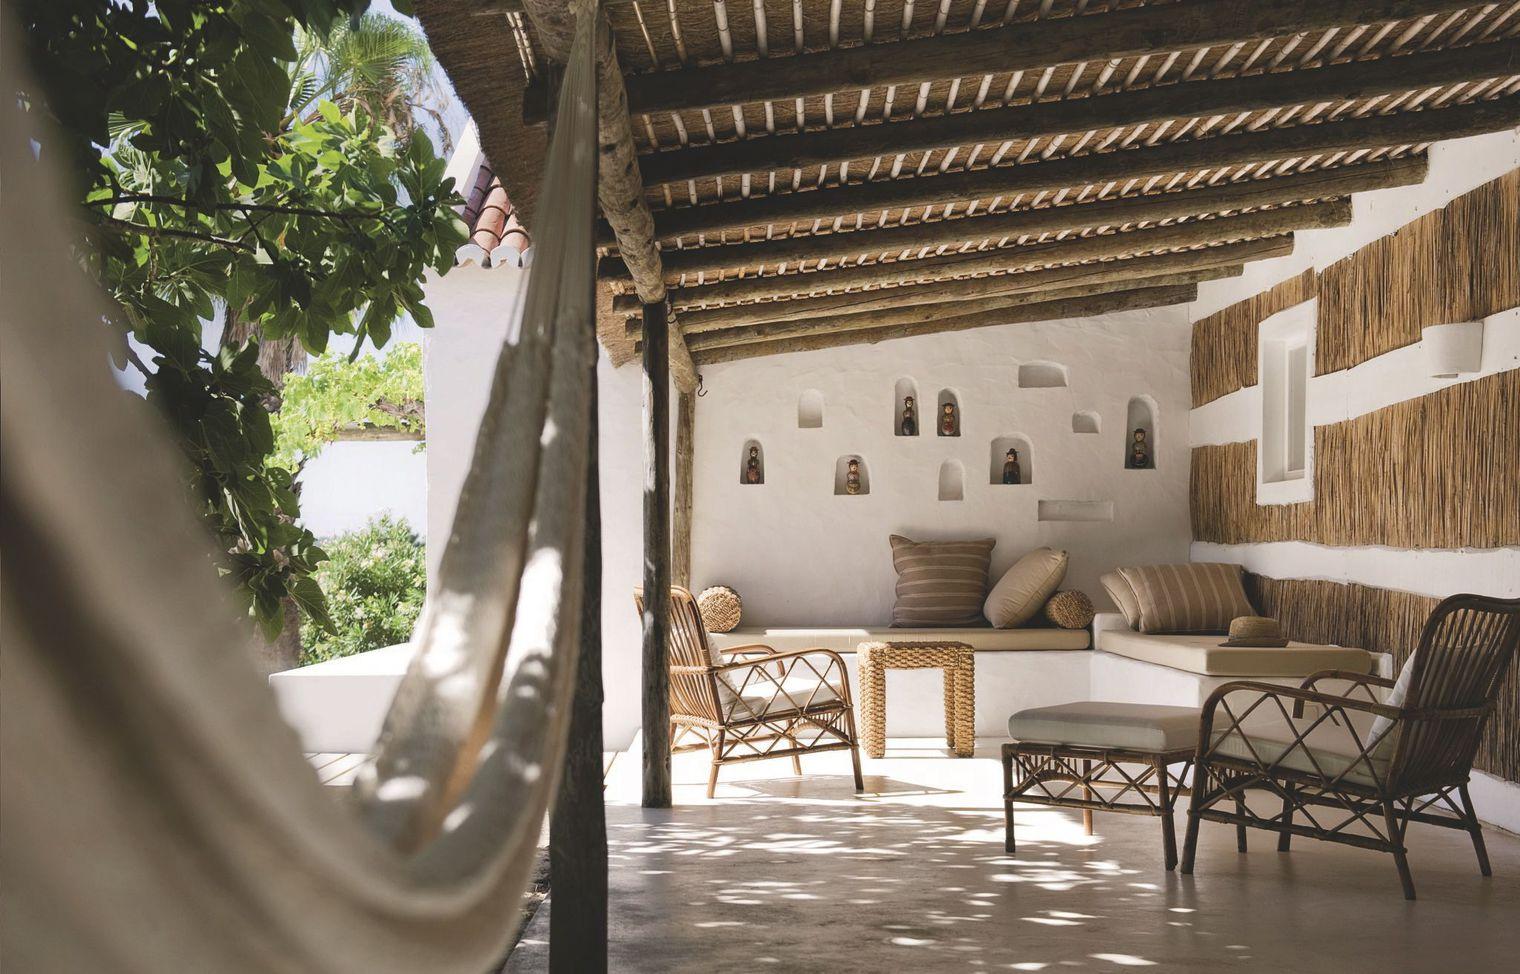 Deco Maison De Charme home interior: fisherman's cabins on the beach